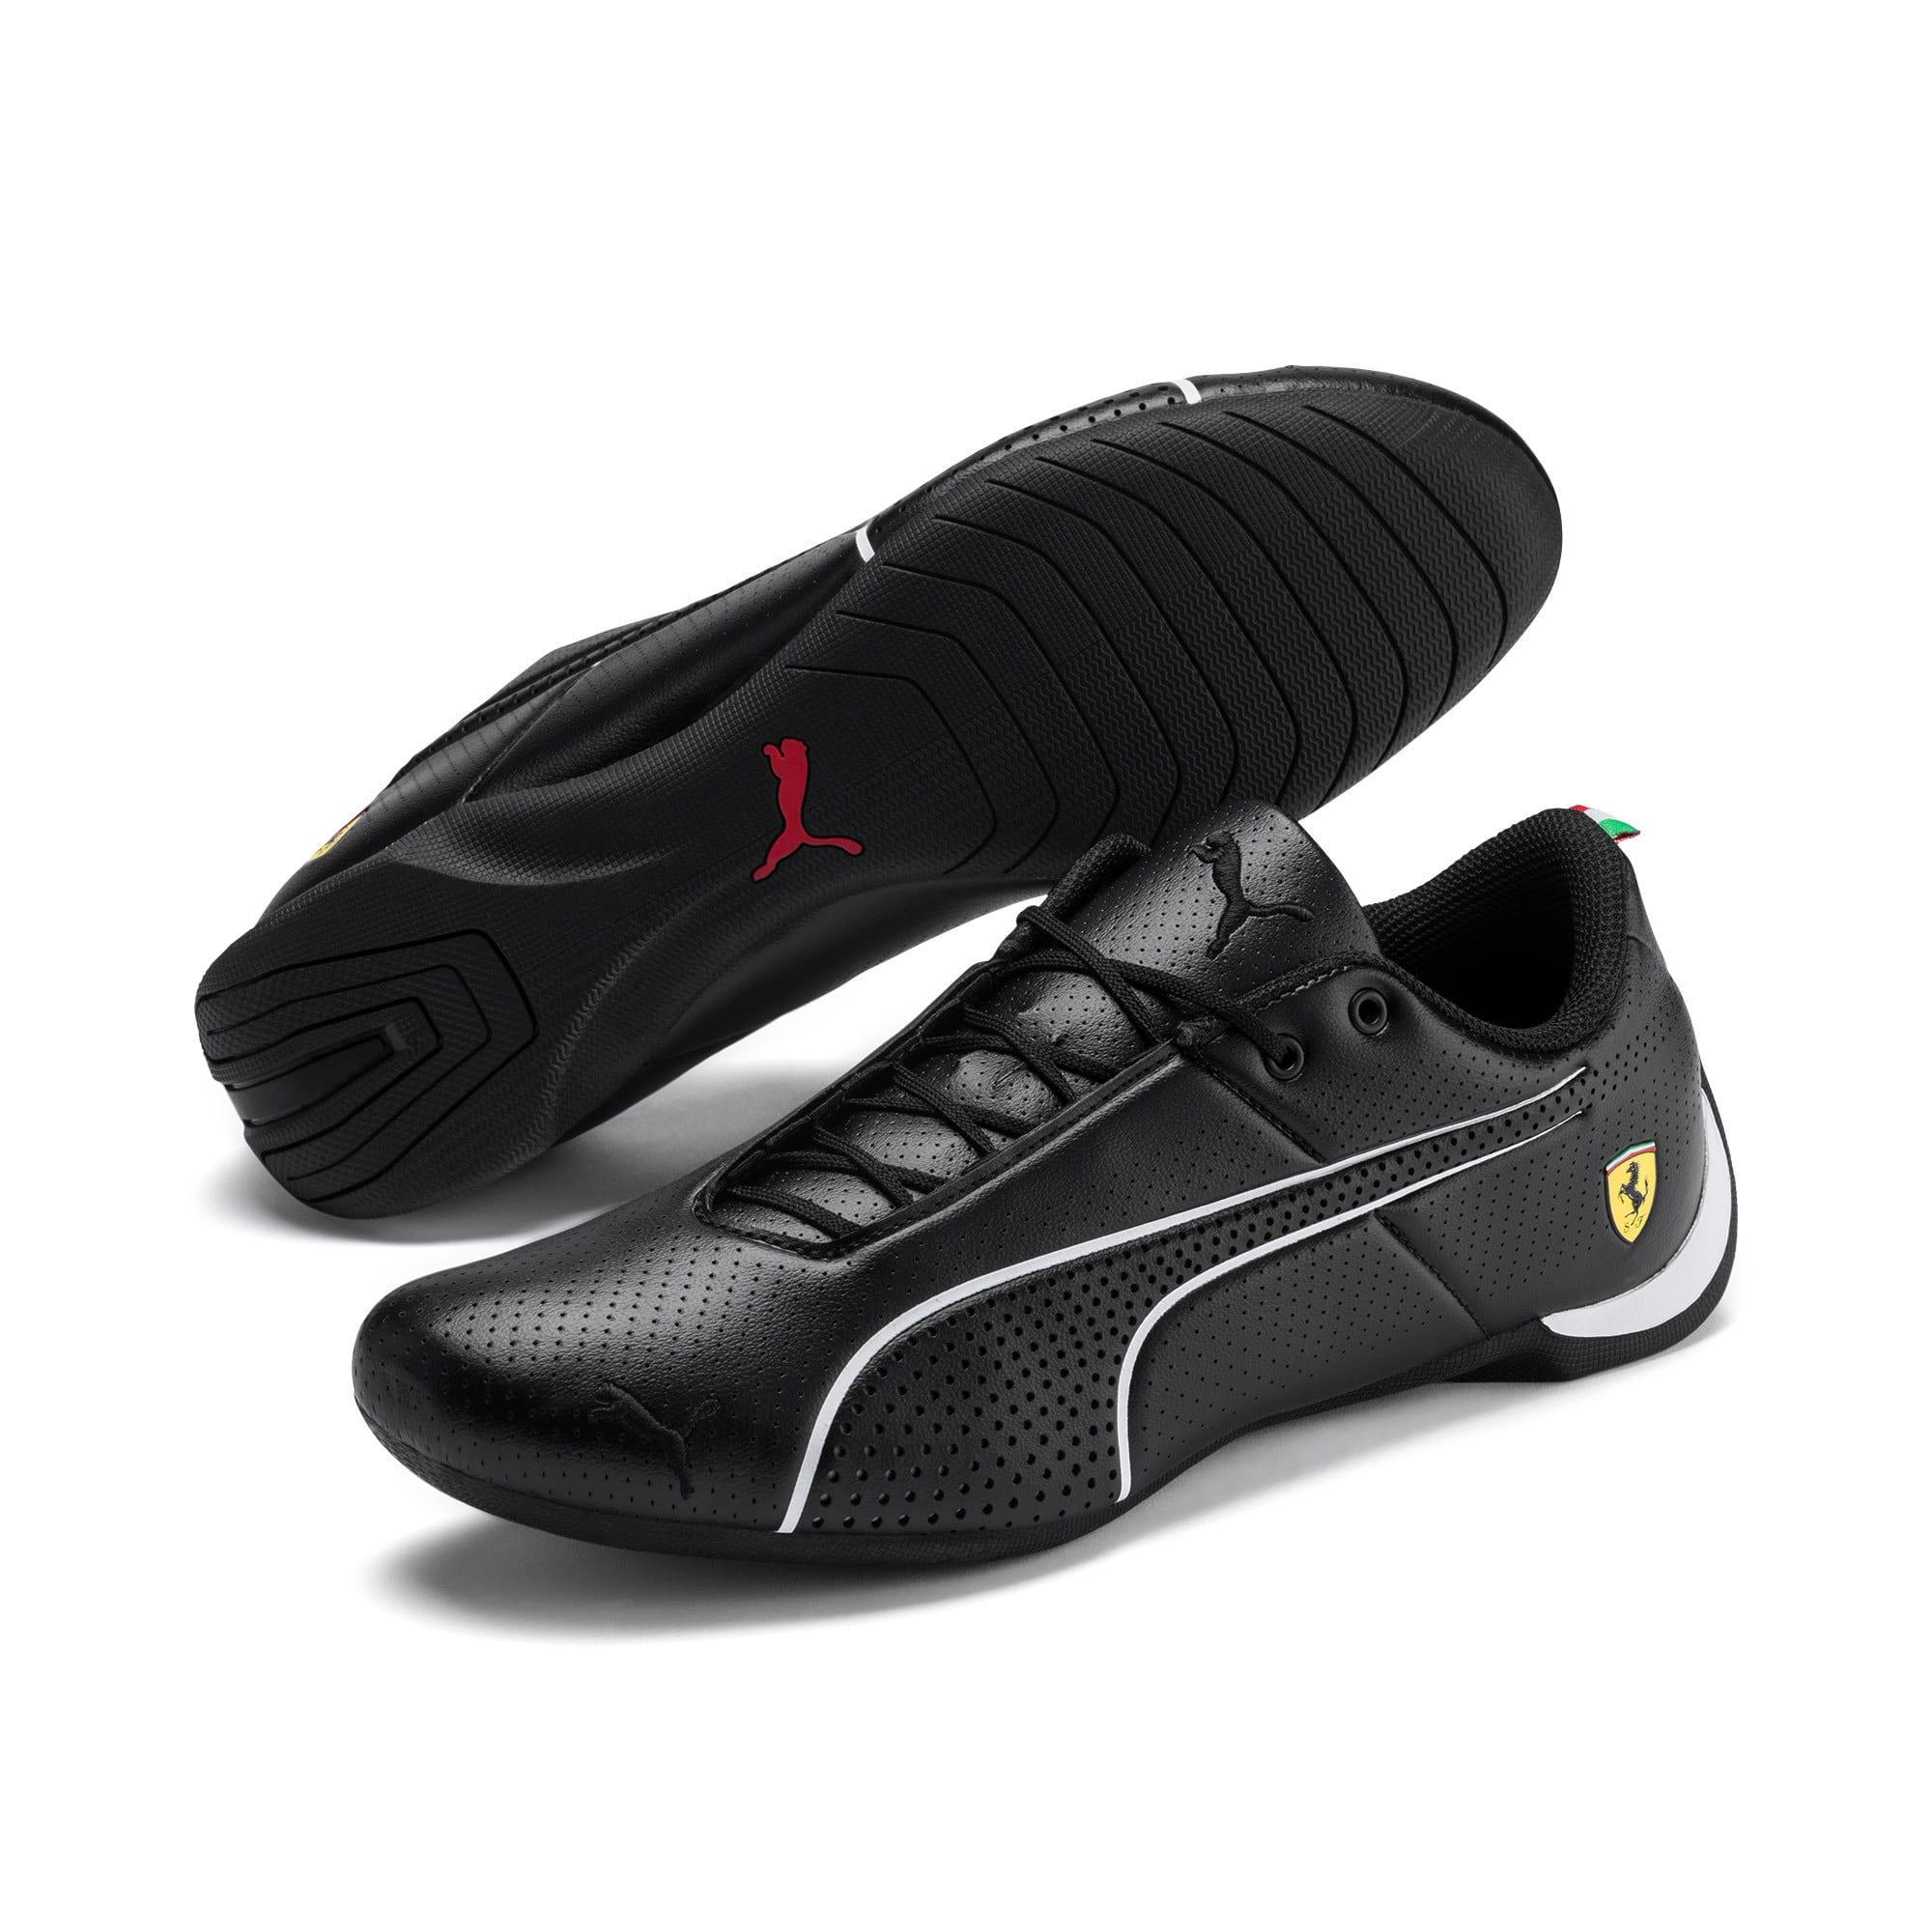 Thumbnail 2 of Scuderia Ferrari Future Cat Ultra Shoes, Puma Black-Puma White, medium